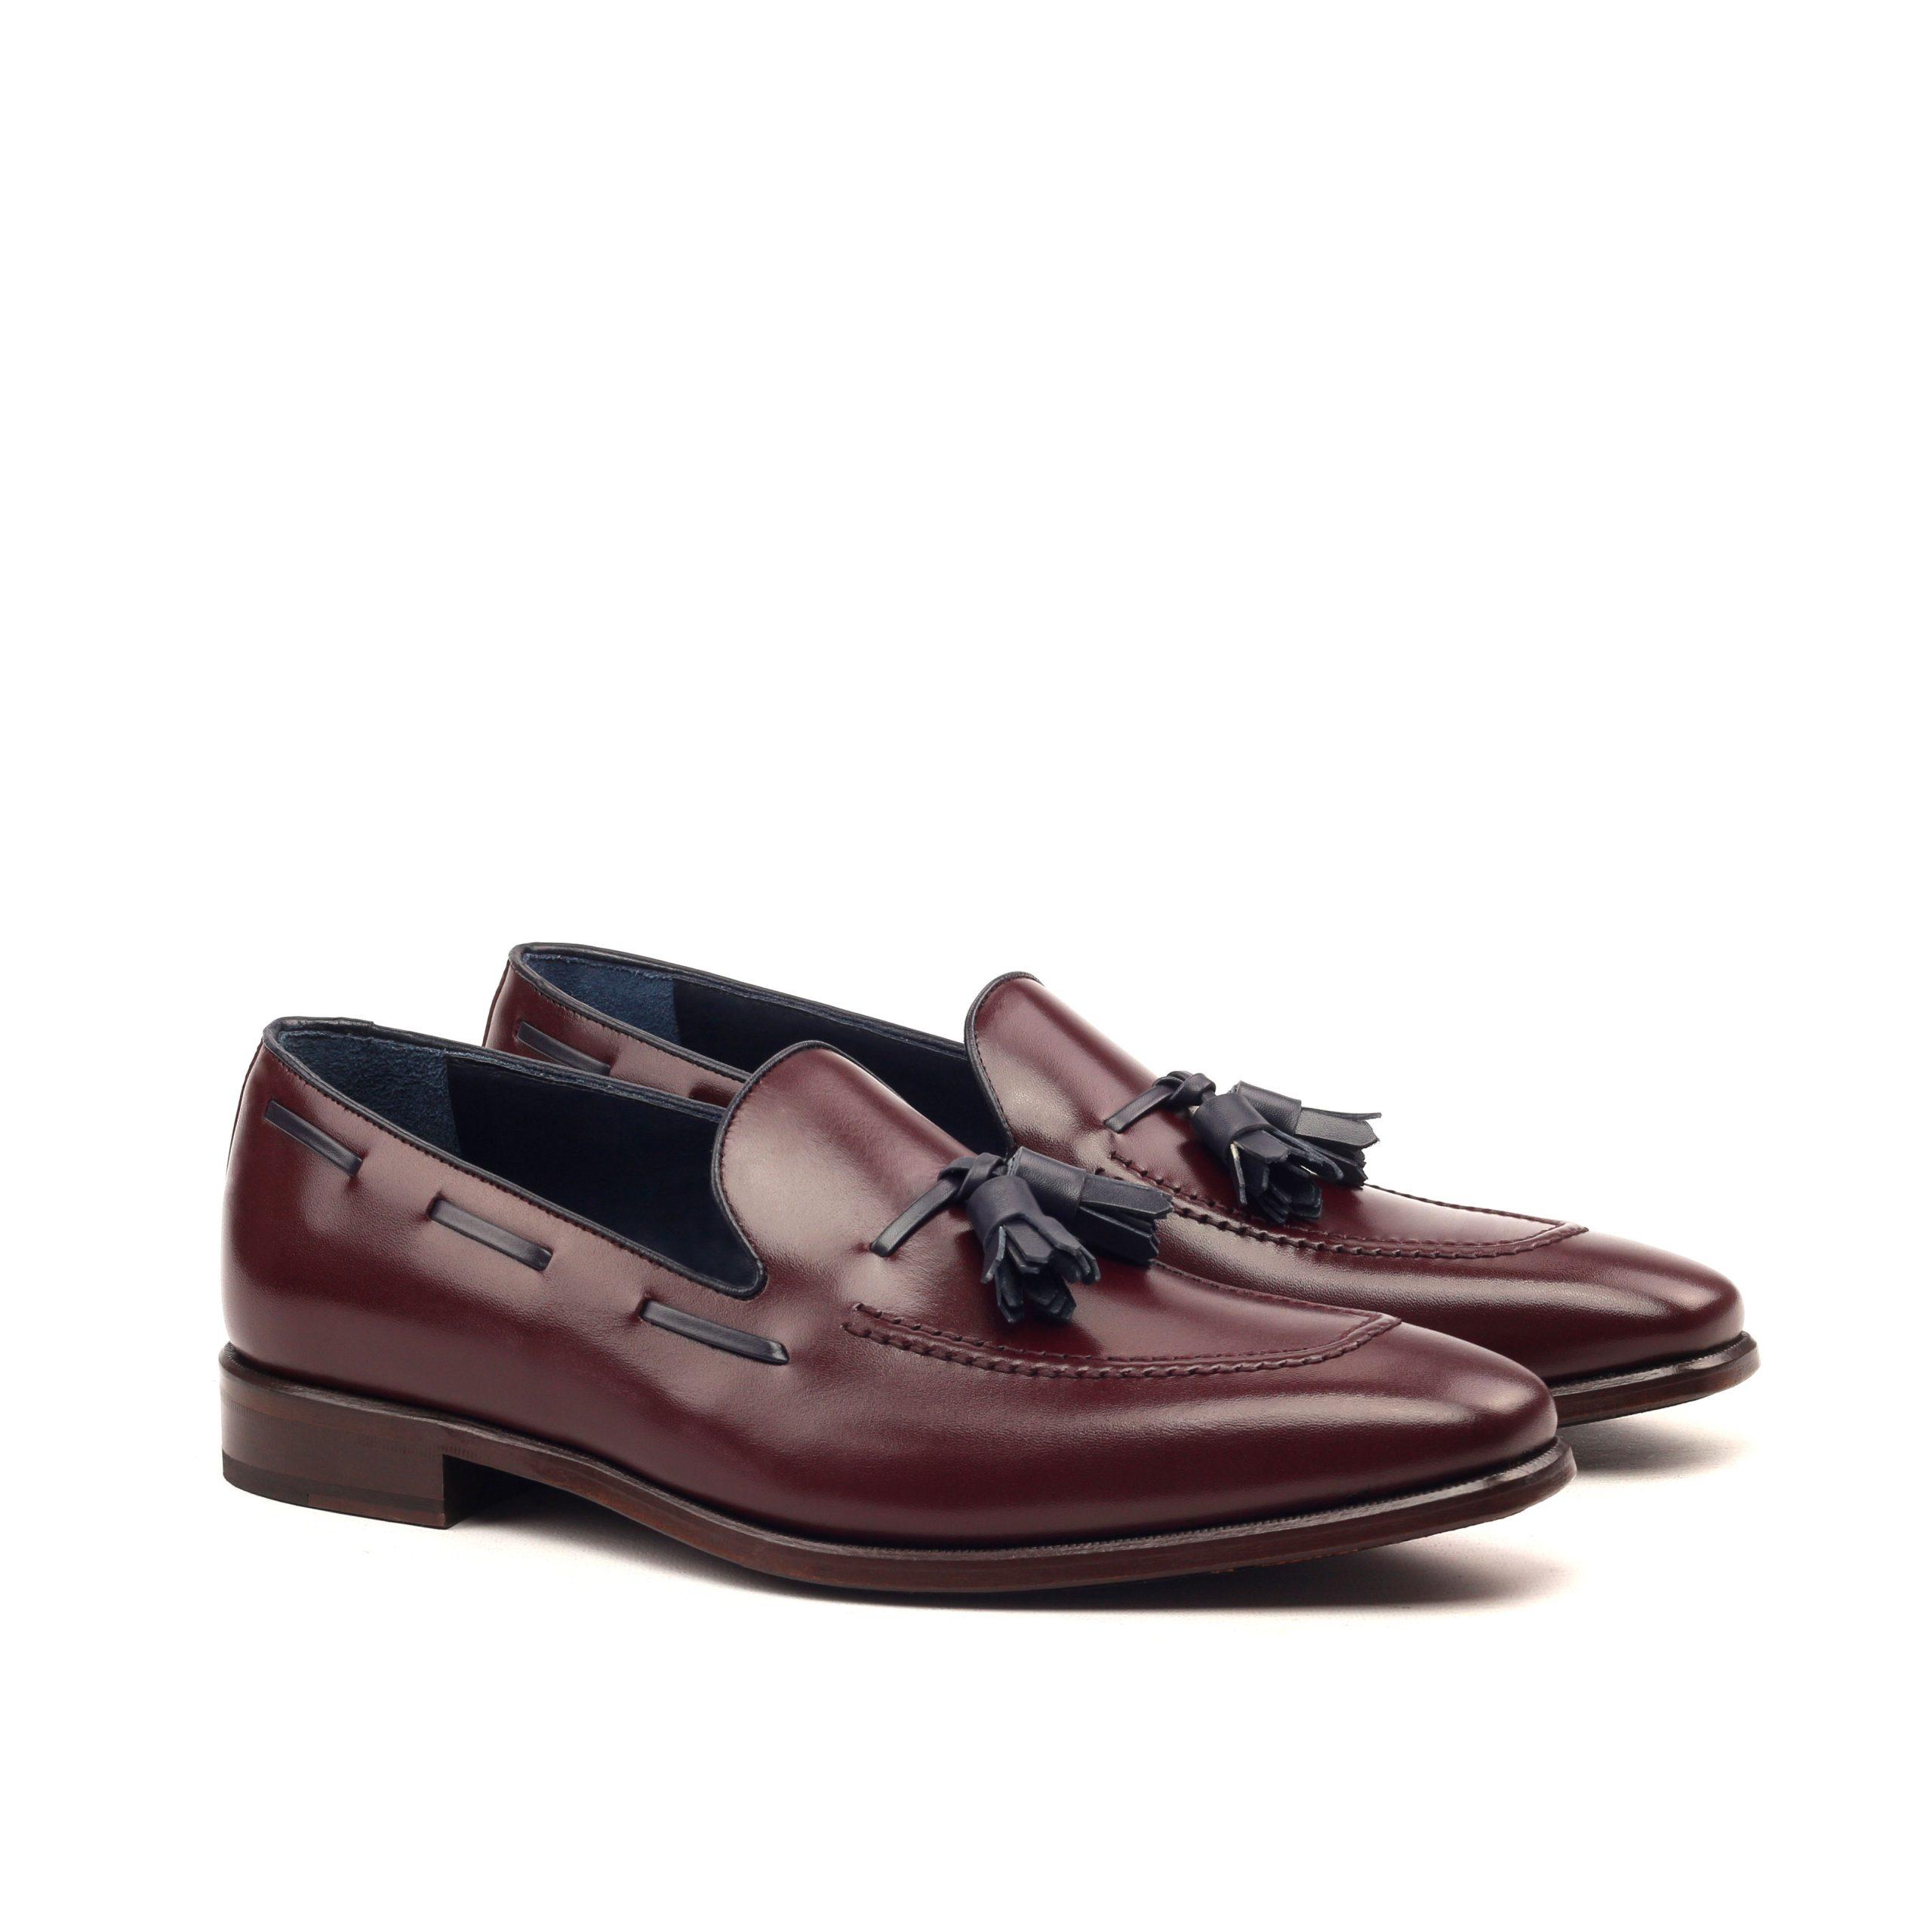 Loafer Tassels - Box Calf Burgundy And Navy-Ang5